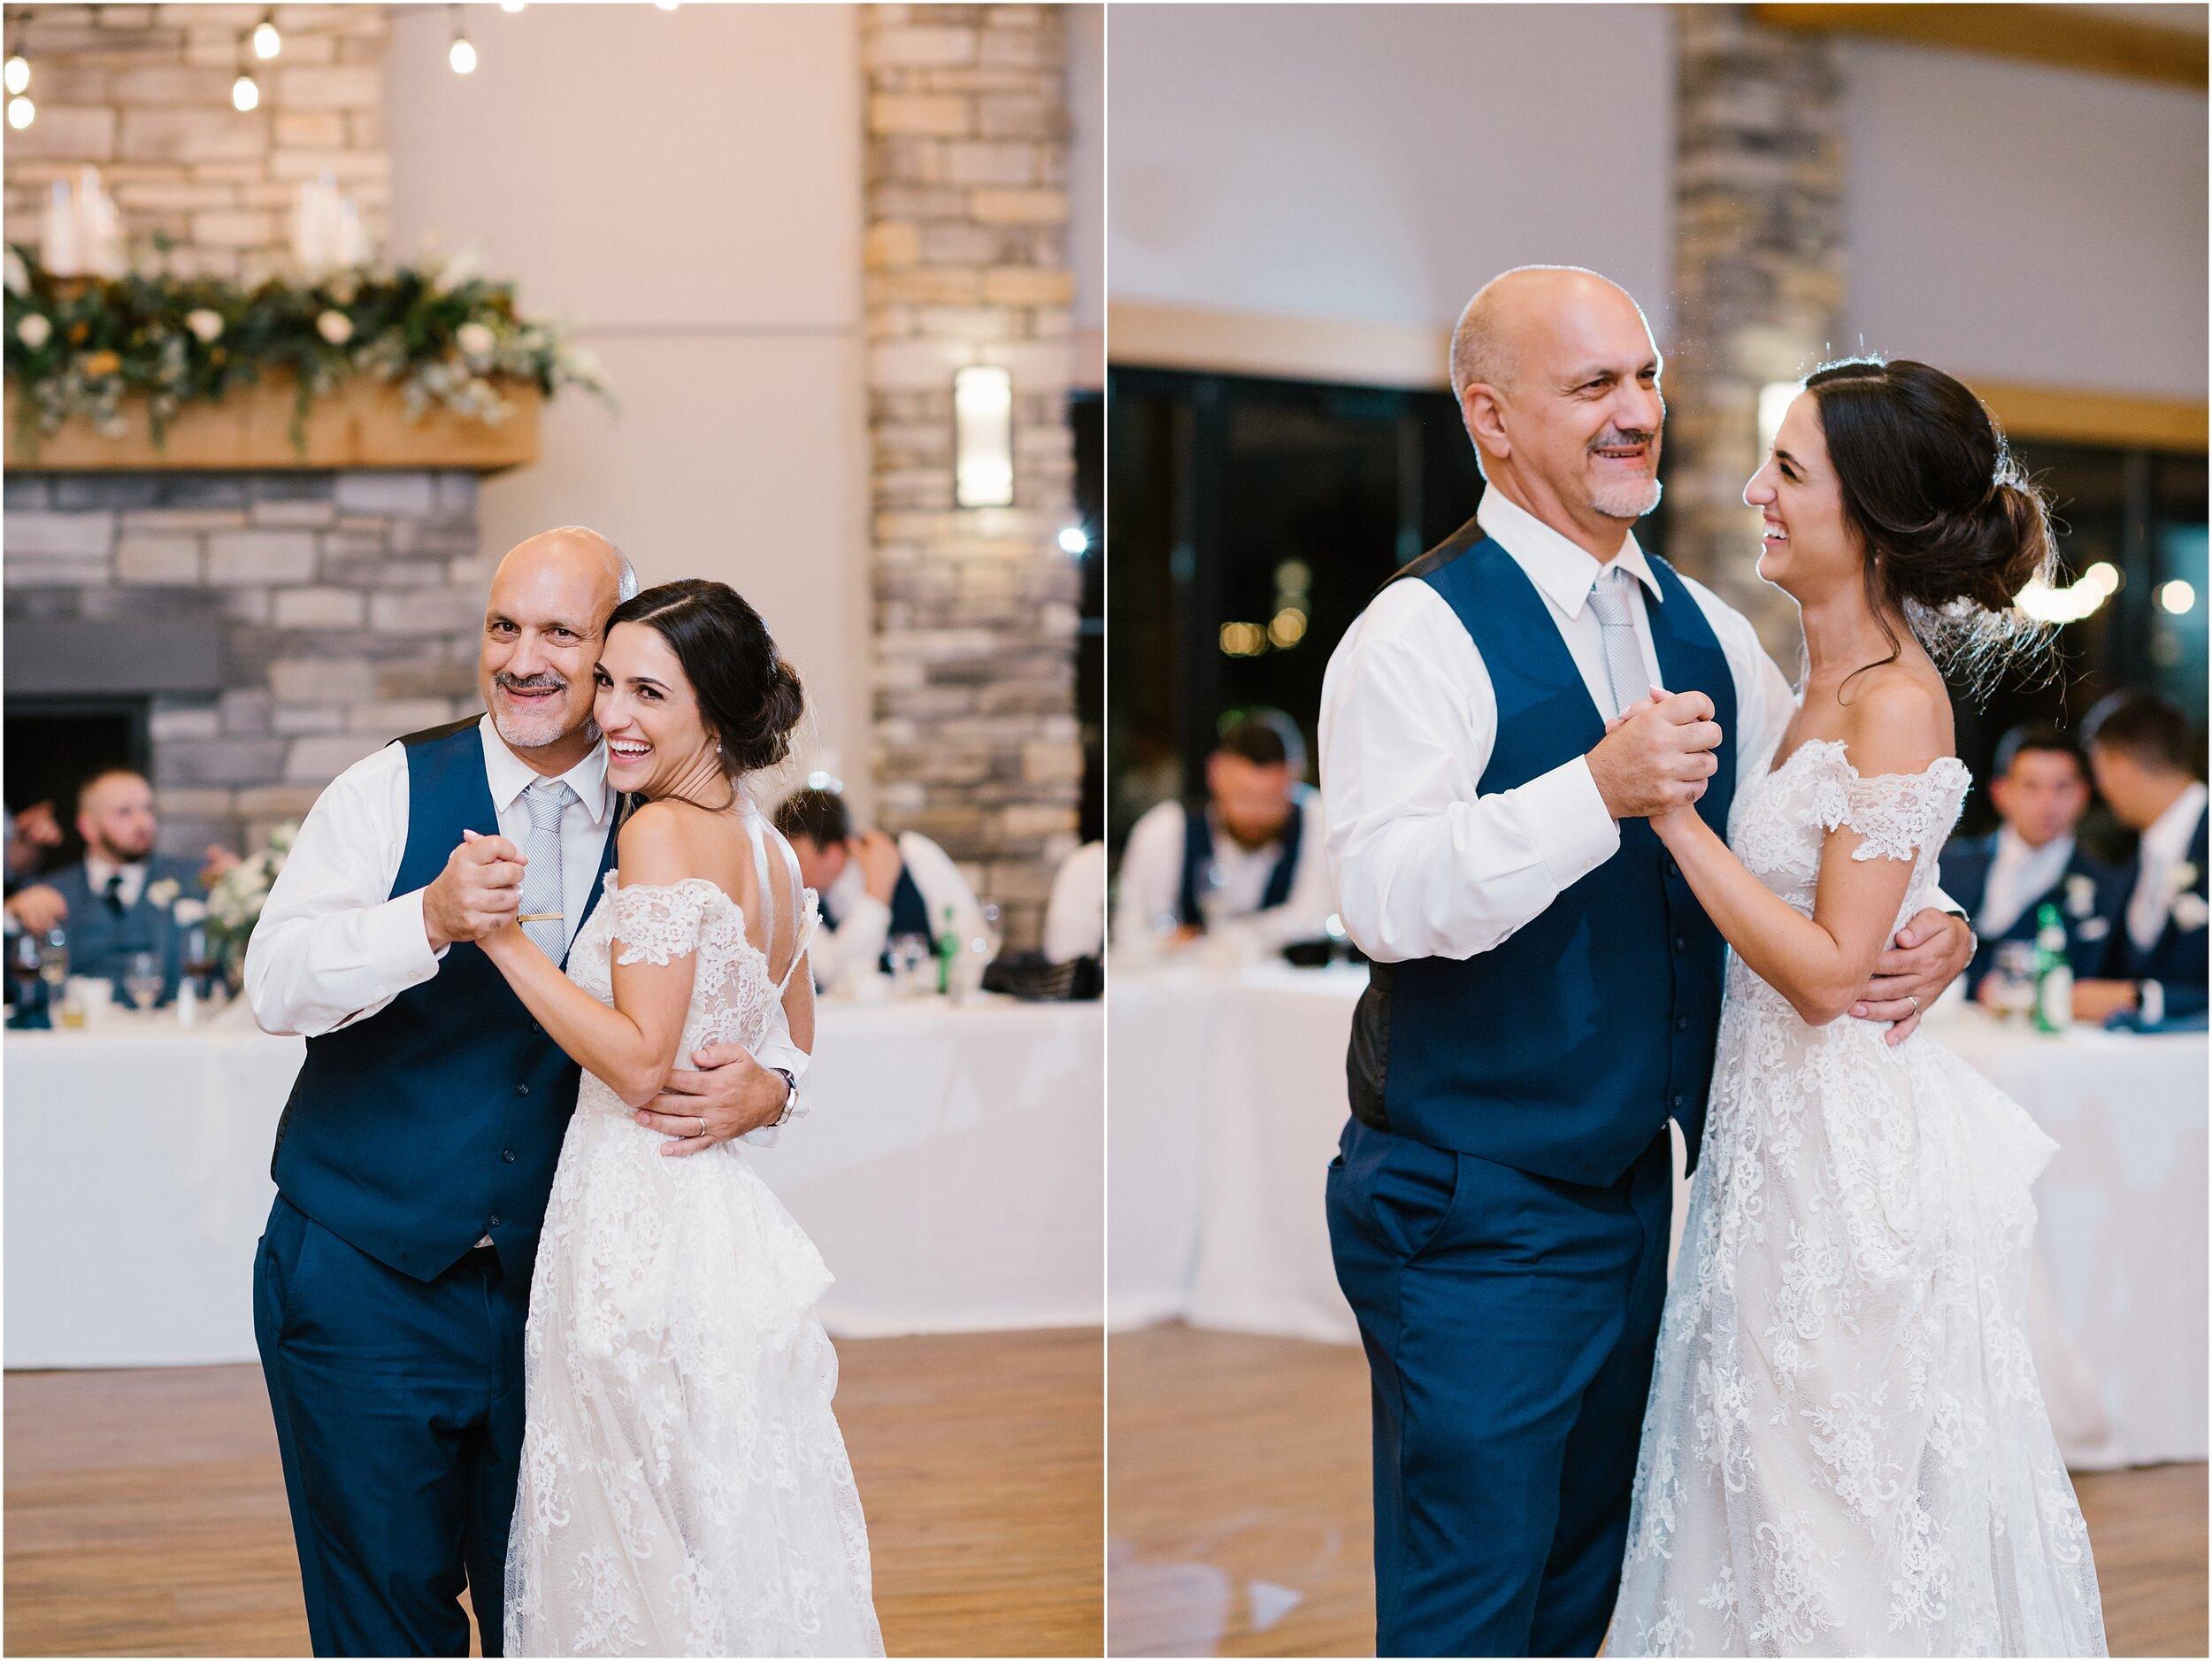 Rebecca Shehorn Photography Indianapolis Wedding Photographer Sycamore at Mallow Run_0779.jpg